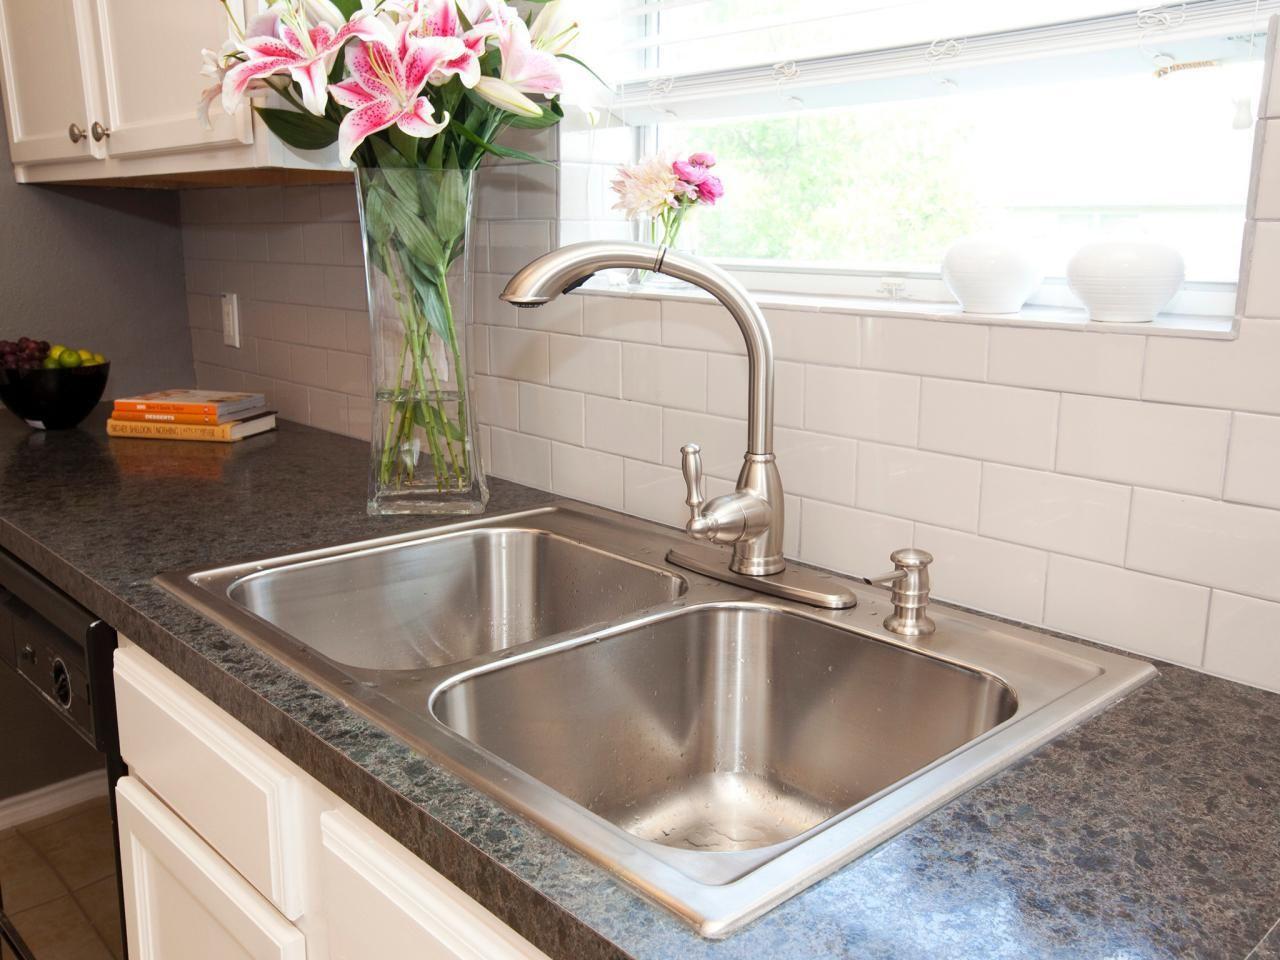 cheap kitchen countertops pictures options ideas kitchen designs